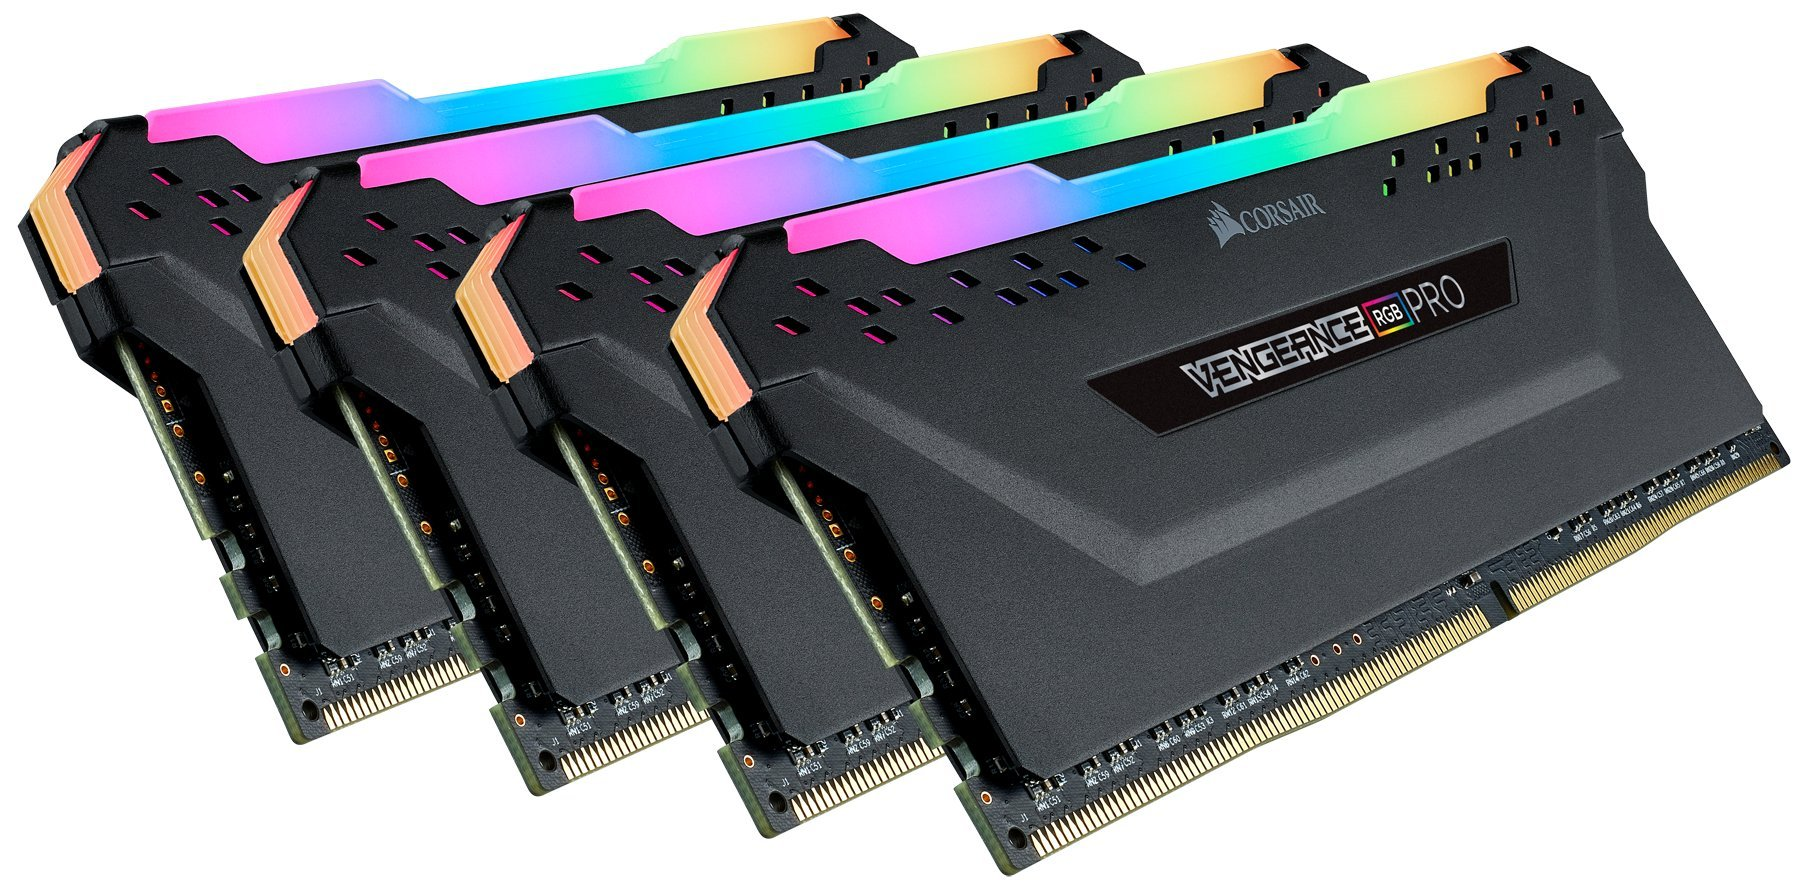 Corsair CMW64GX4M4C3200C16 Vengeance RGB PRO 64GB (4x16GB) DDR4 3200 (PC4-25600) C16 Desktop Memory Black by Corsair